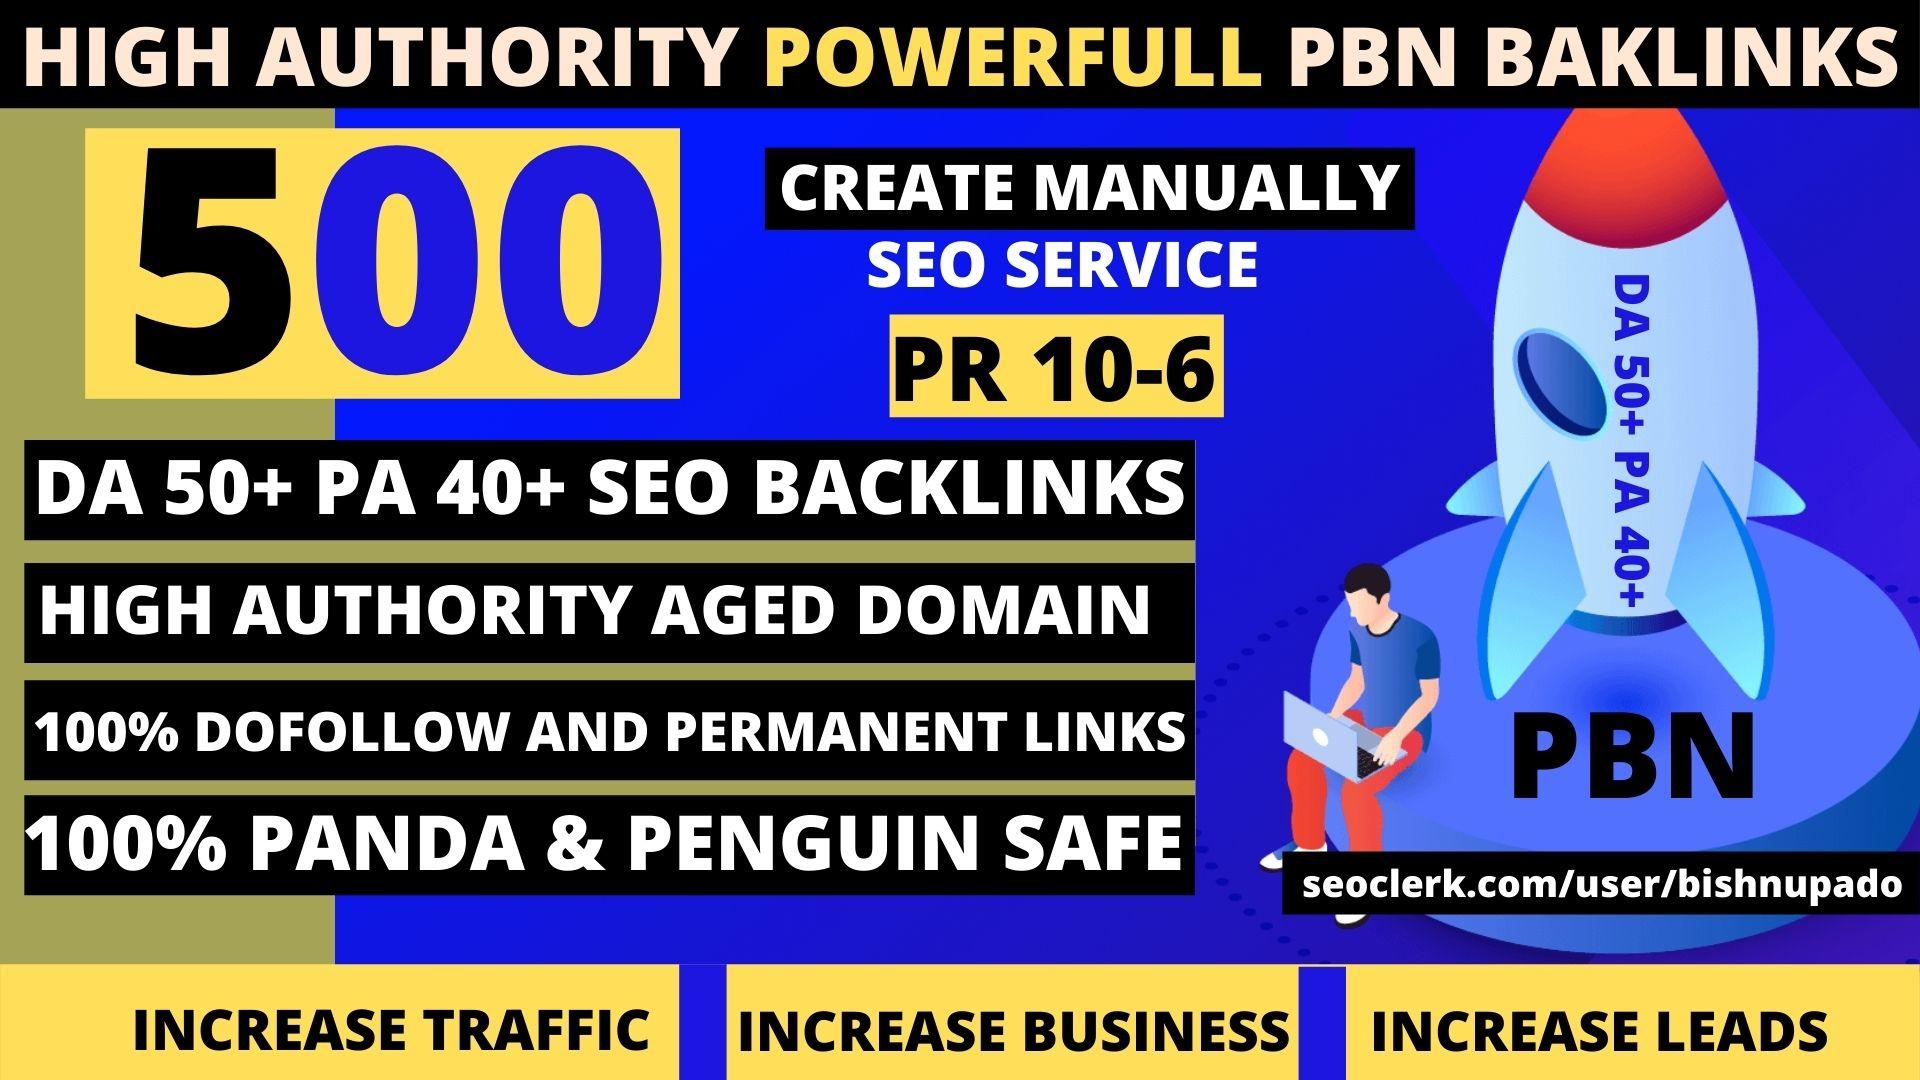 premium permanent 500 Pbn Backlink homepage DA50+ PA40+DR60+PR6+web 2.0 unique site